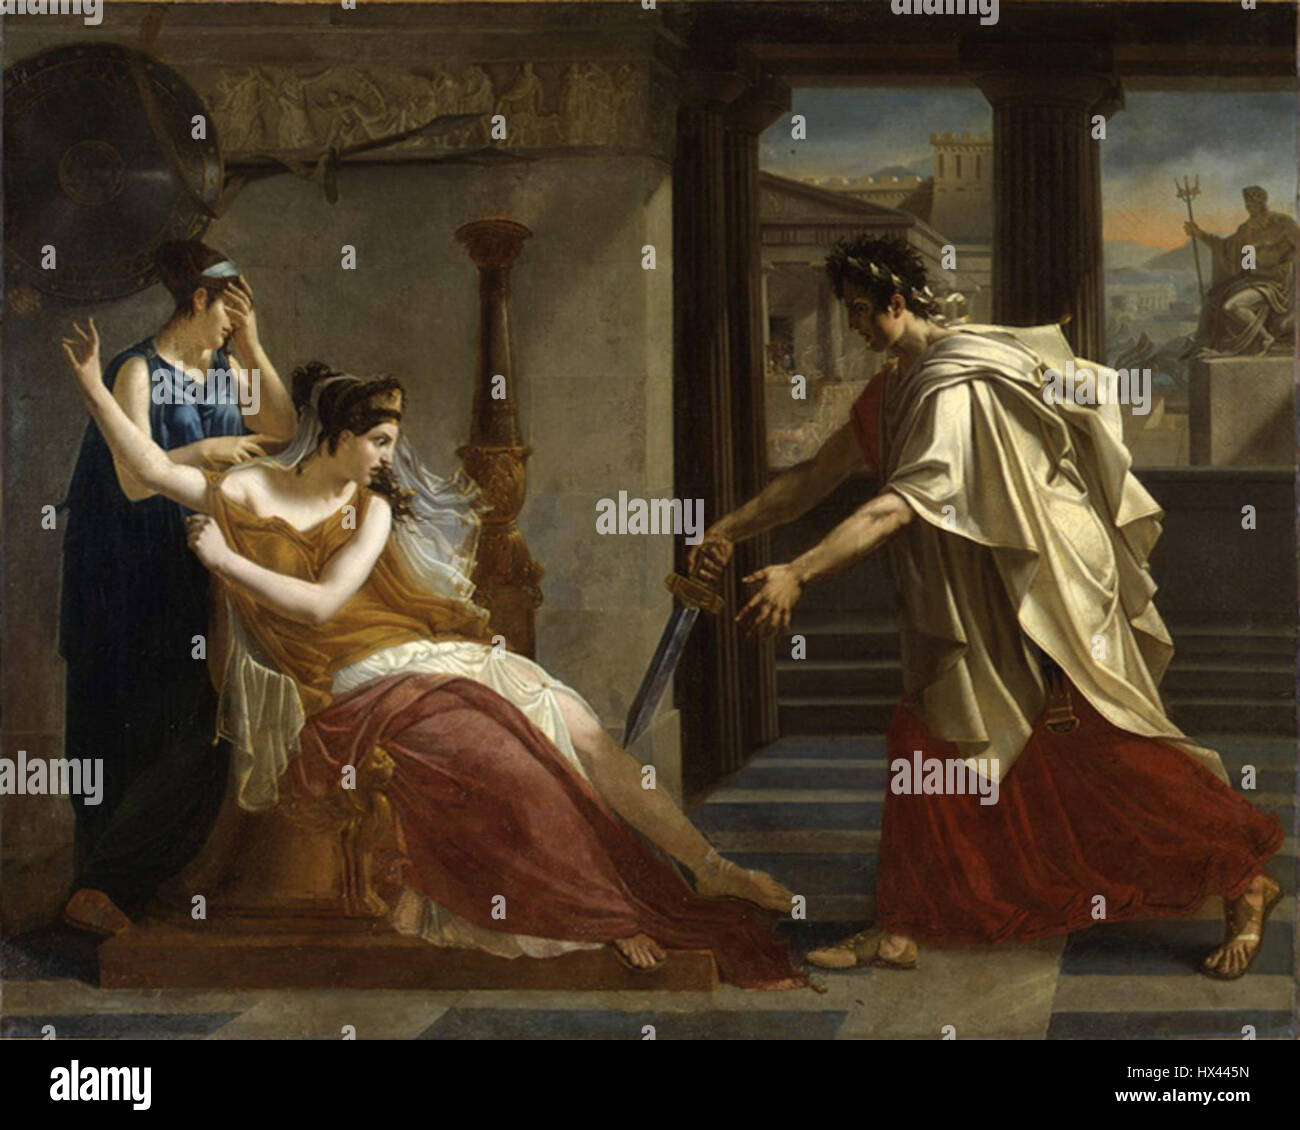 Guerin Hermione et Oreste - Stock Image